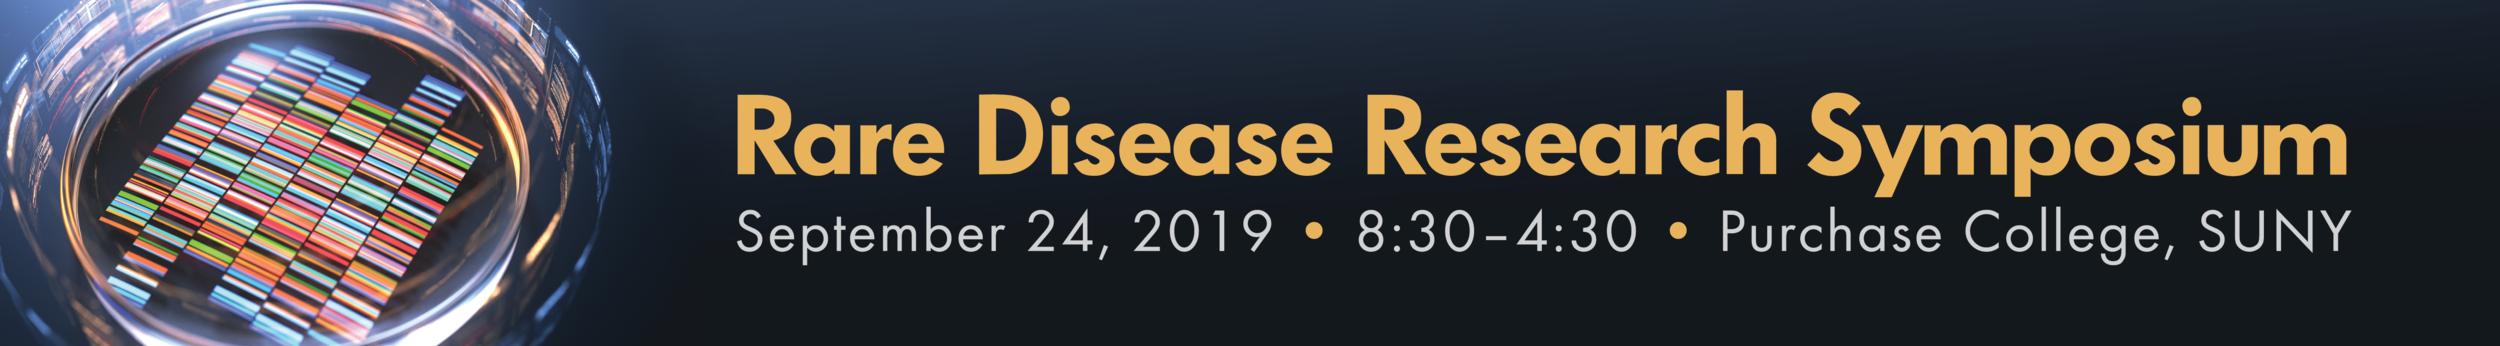 Rare Disease Symposium 2019 Header_v1.png